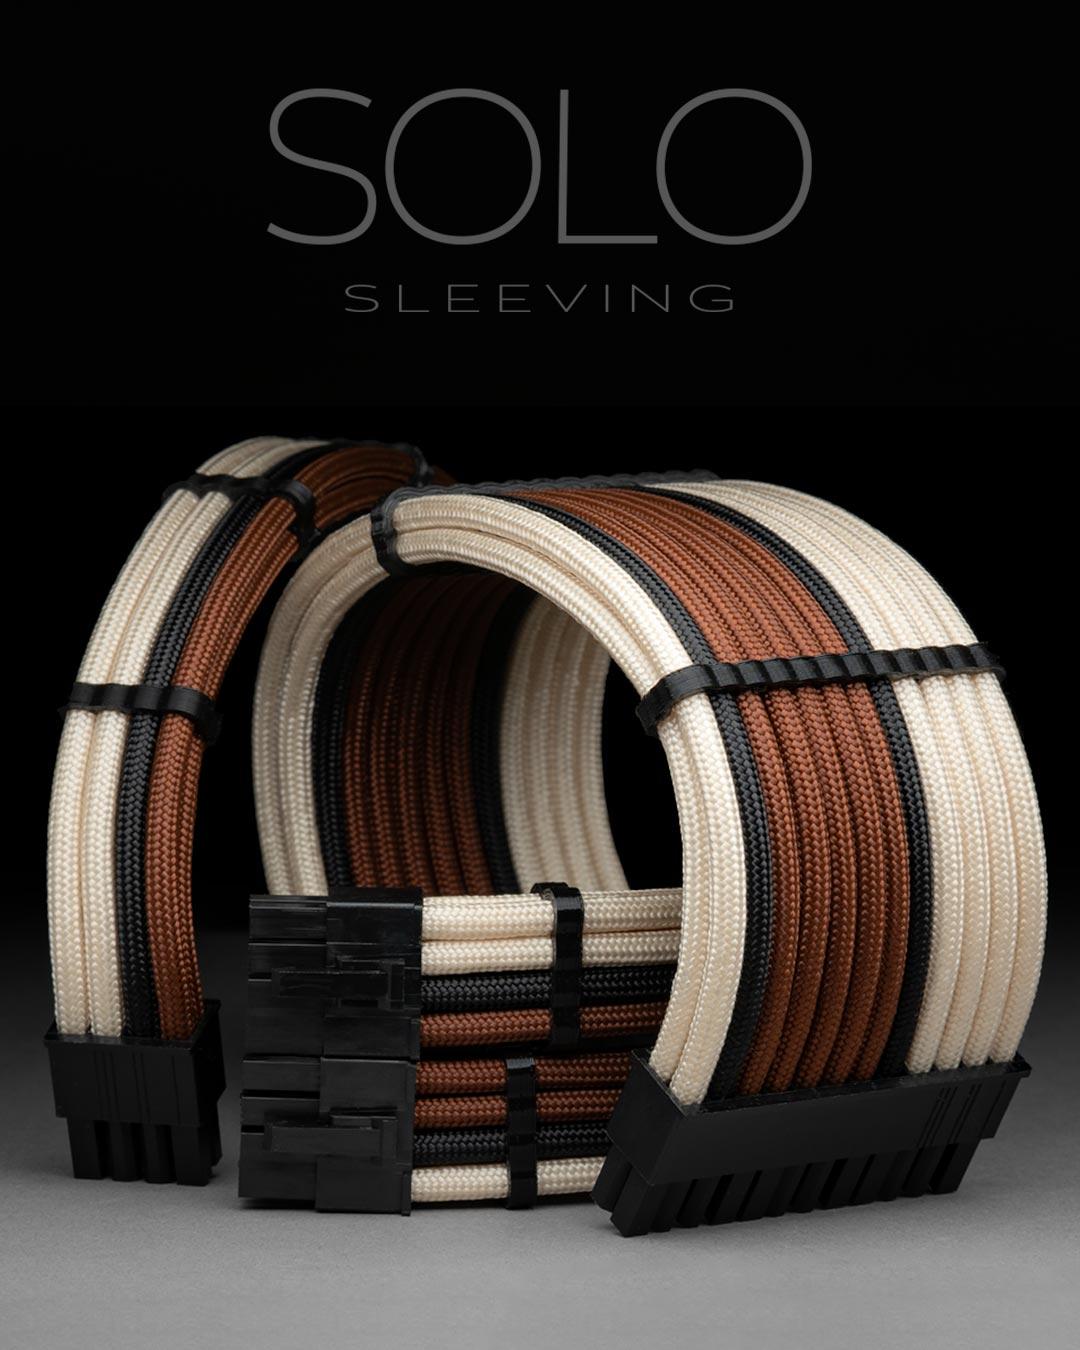 Noctua Color Sleeved Extension Cables